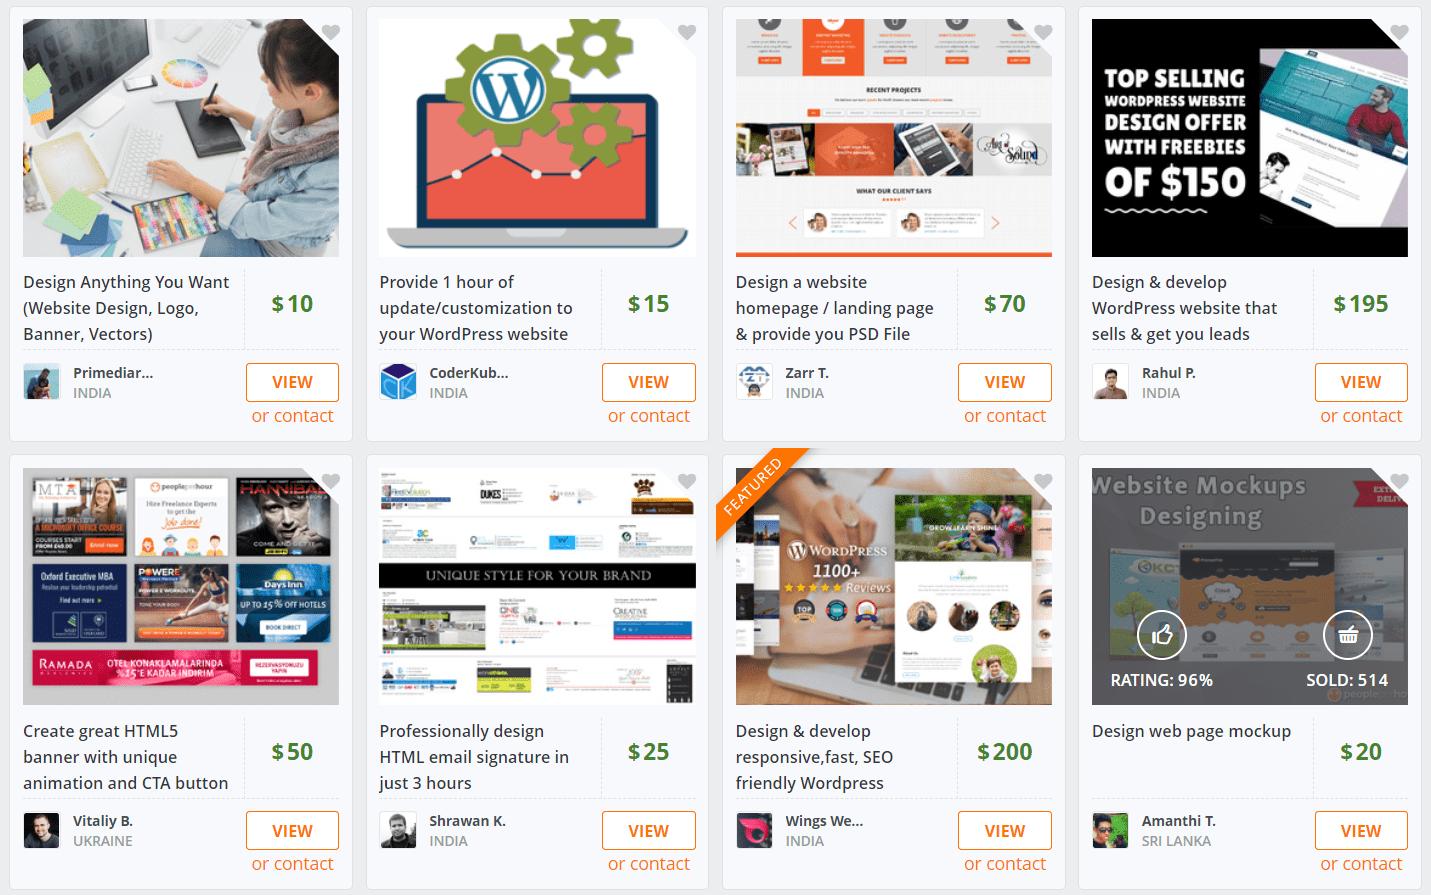 PeoplePerHour's web design offer listings